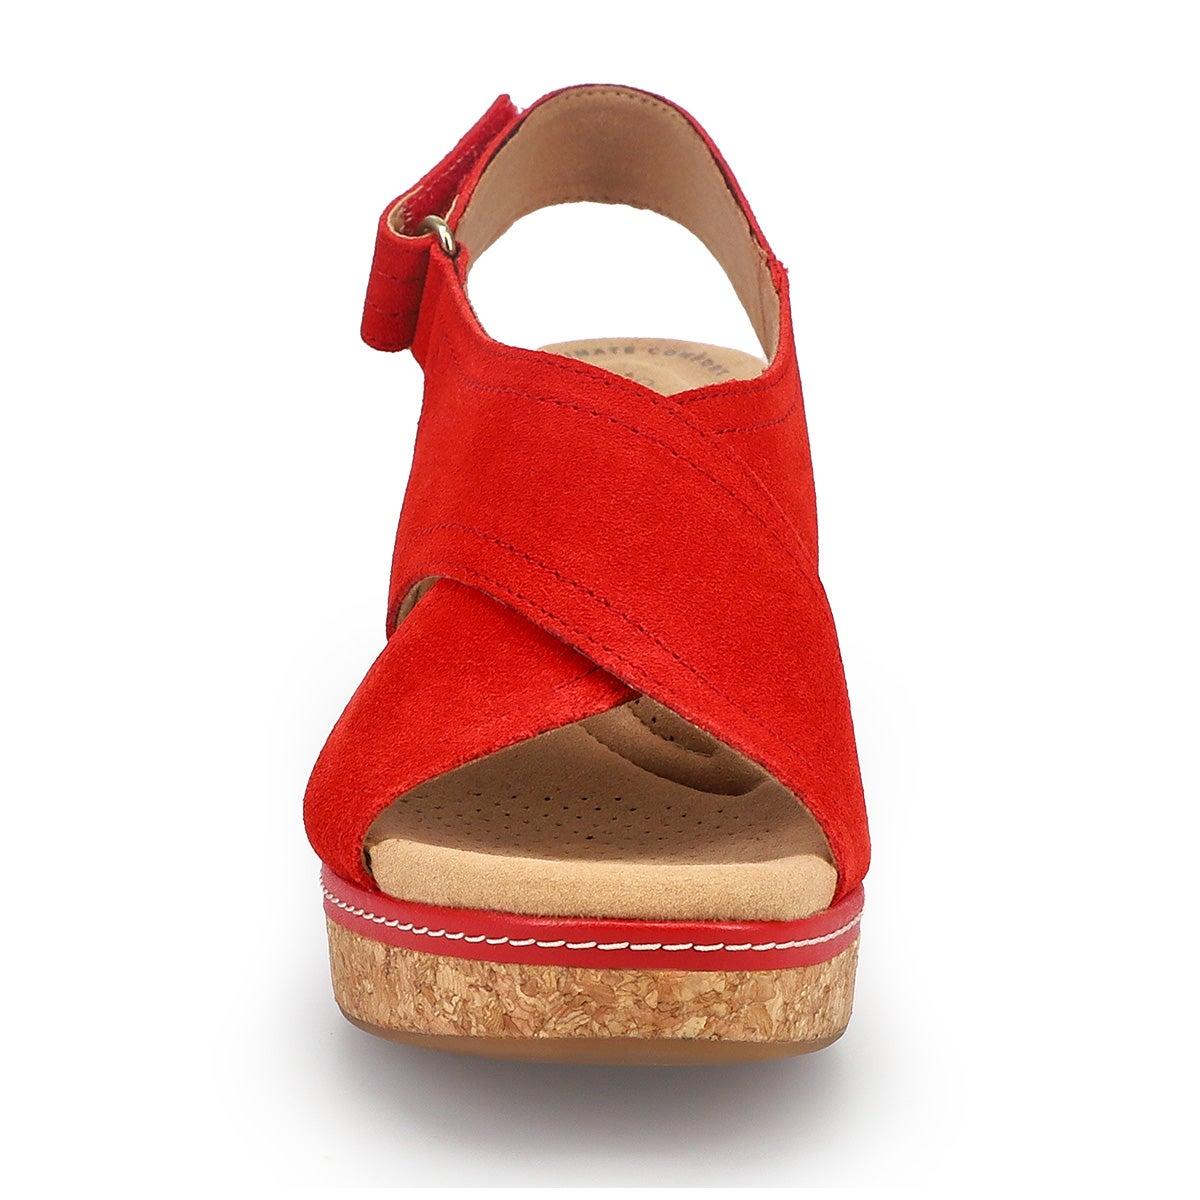 Women's Giselle Cove Wedge Sandal - Red